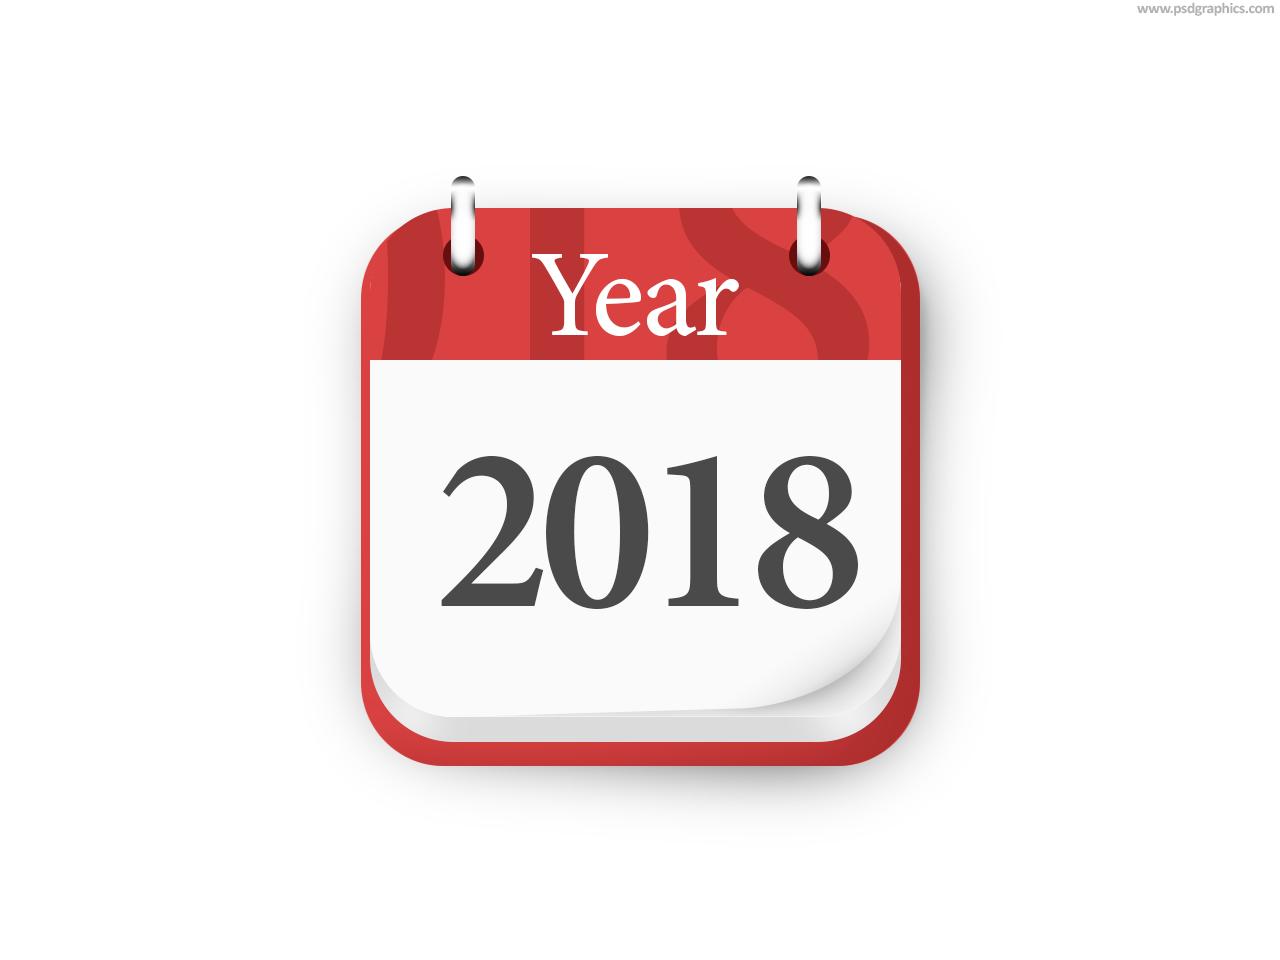 year 2018 calendar icon psd psdgraphics